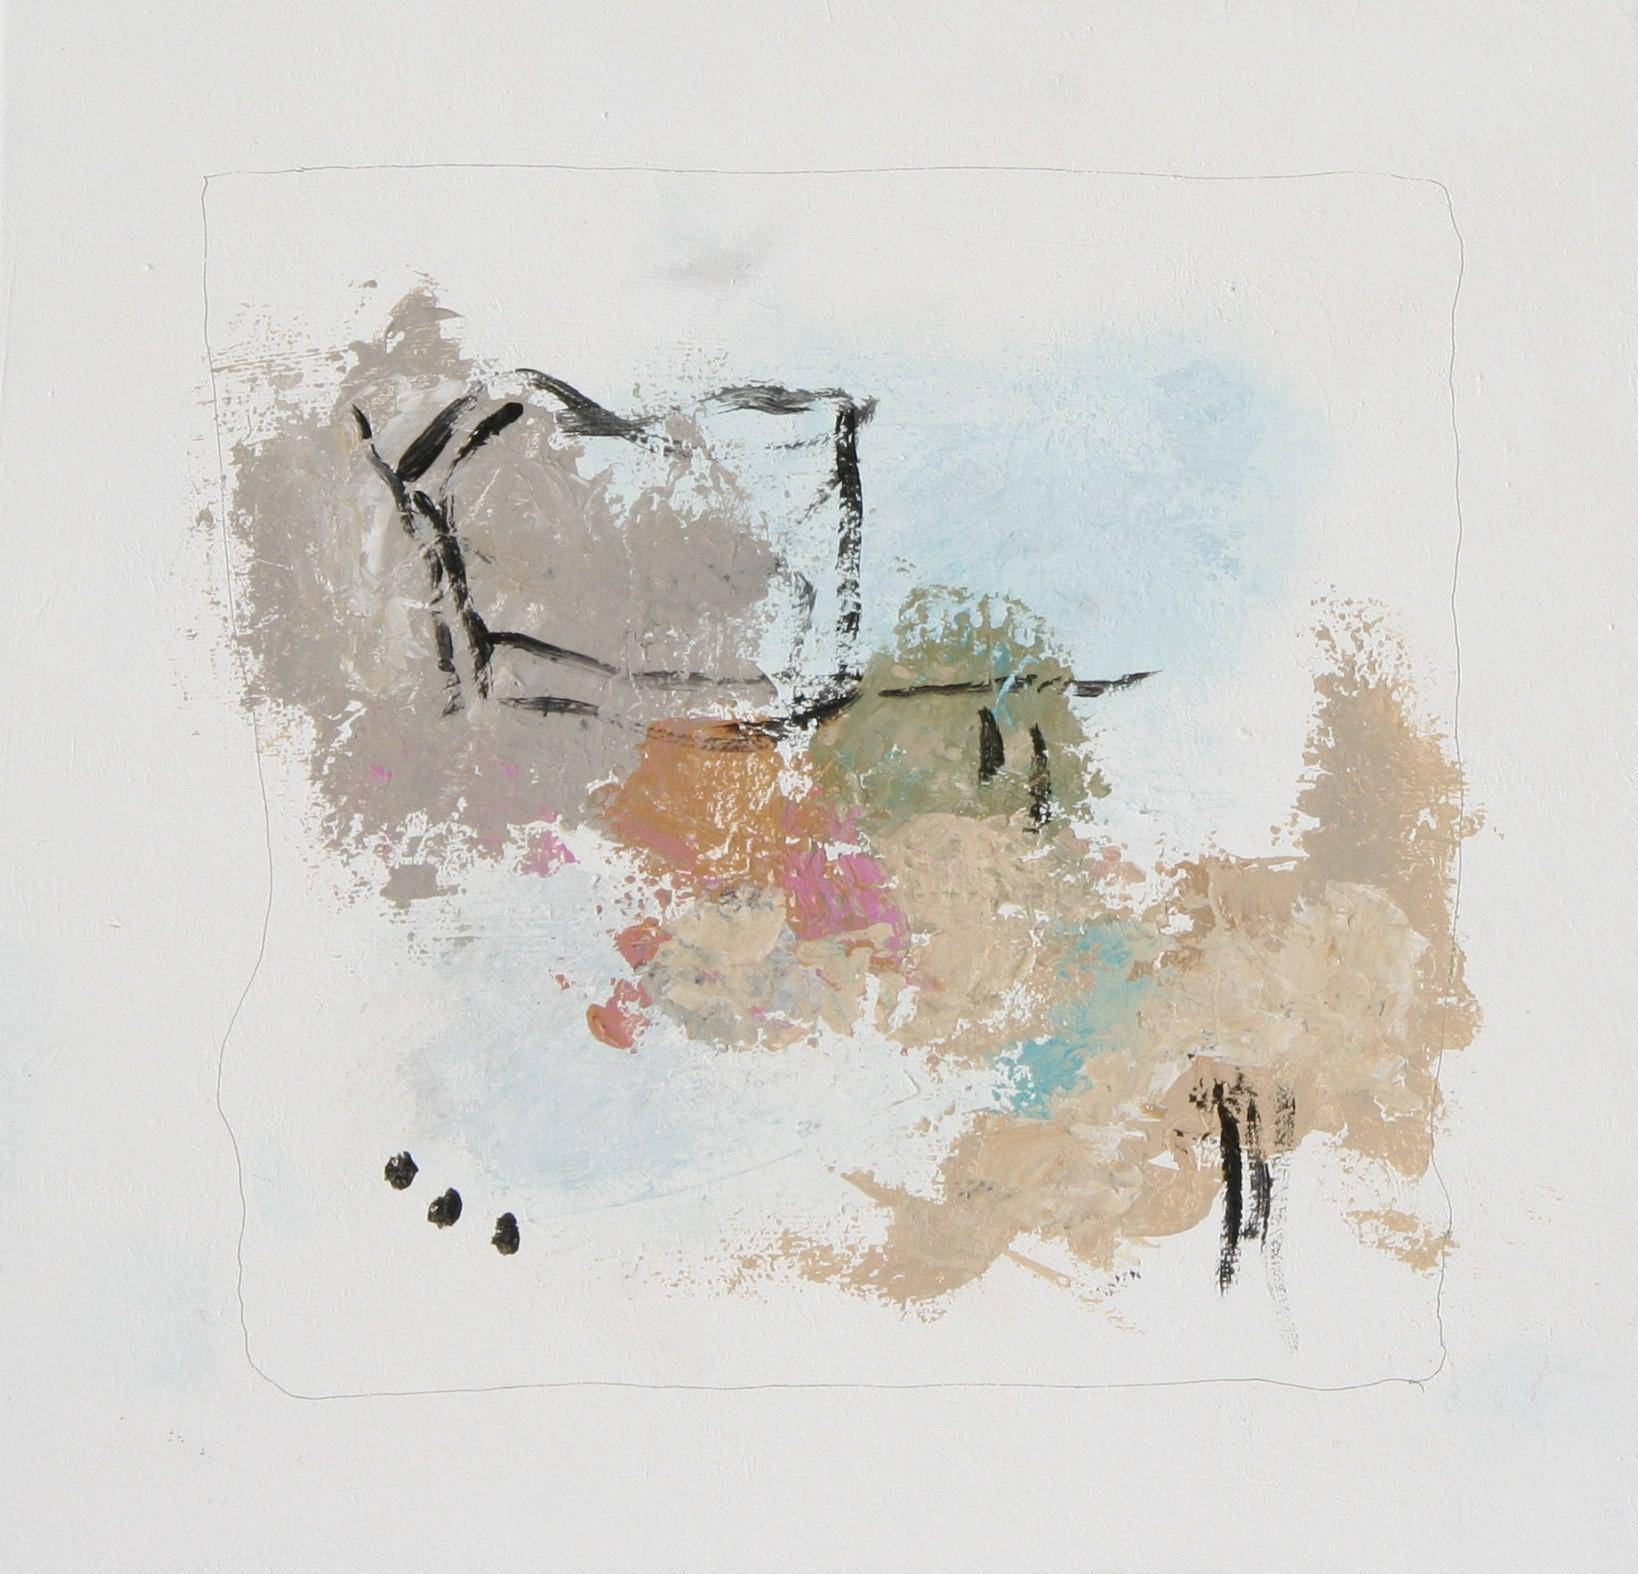 Zomerse Kunstroute toont divers werk